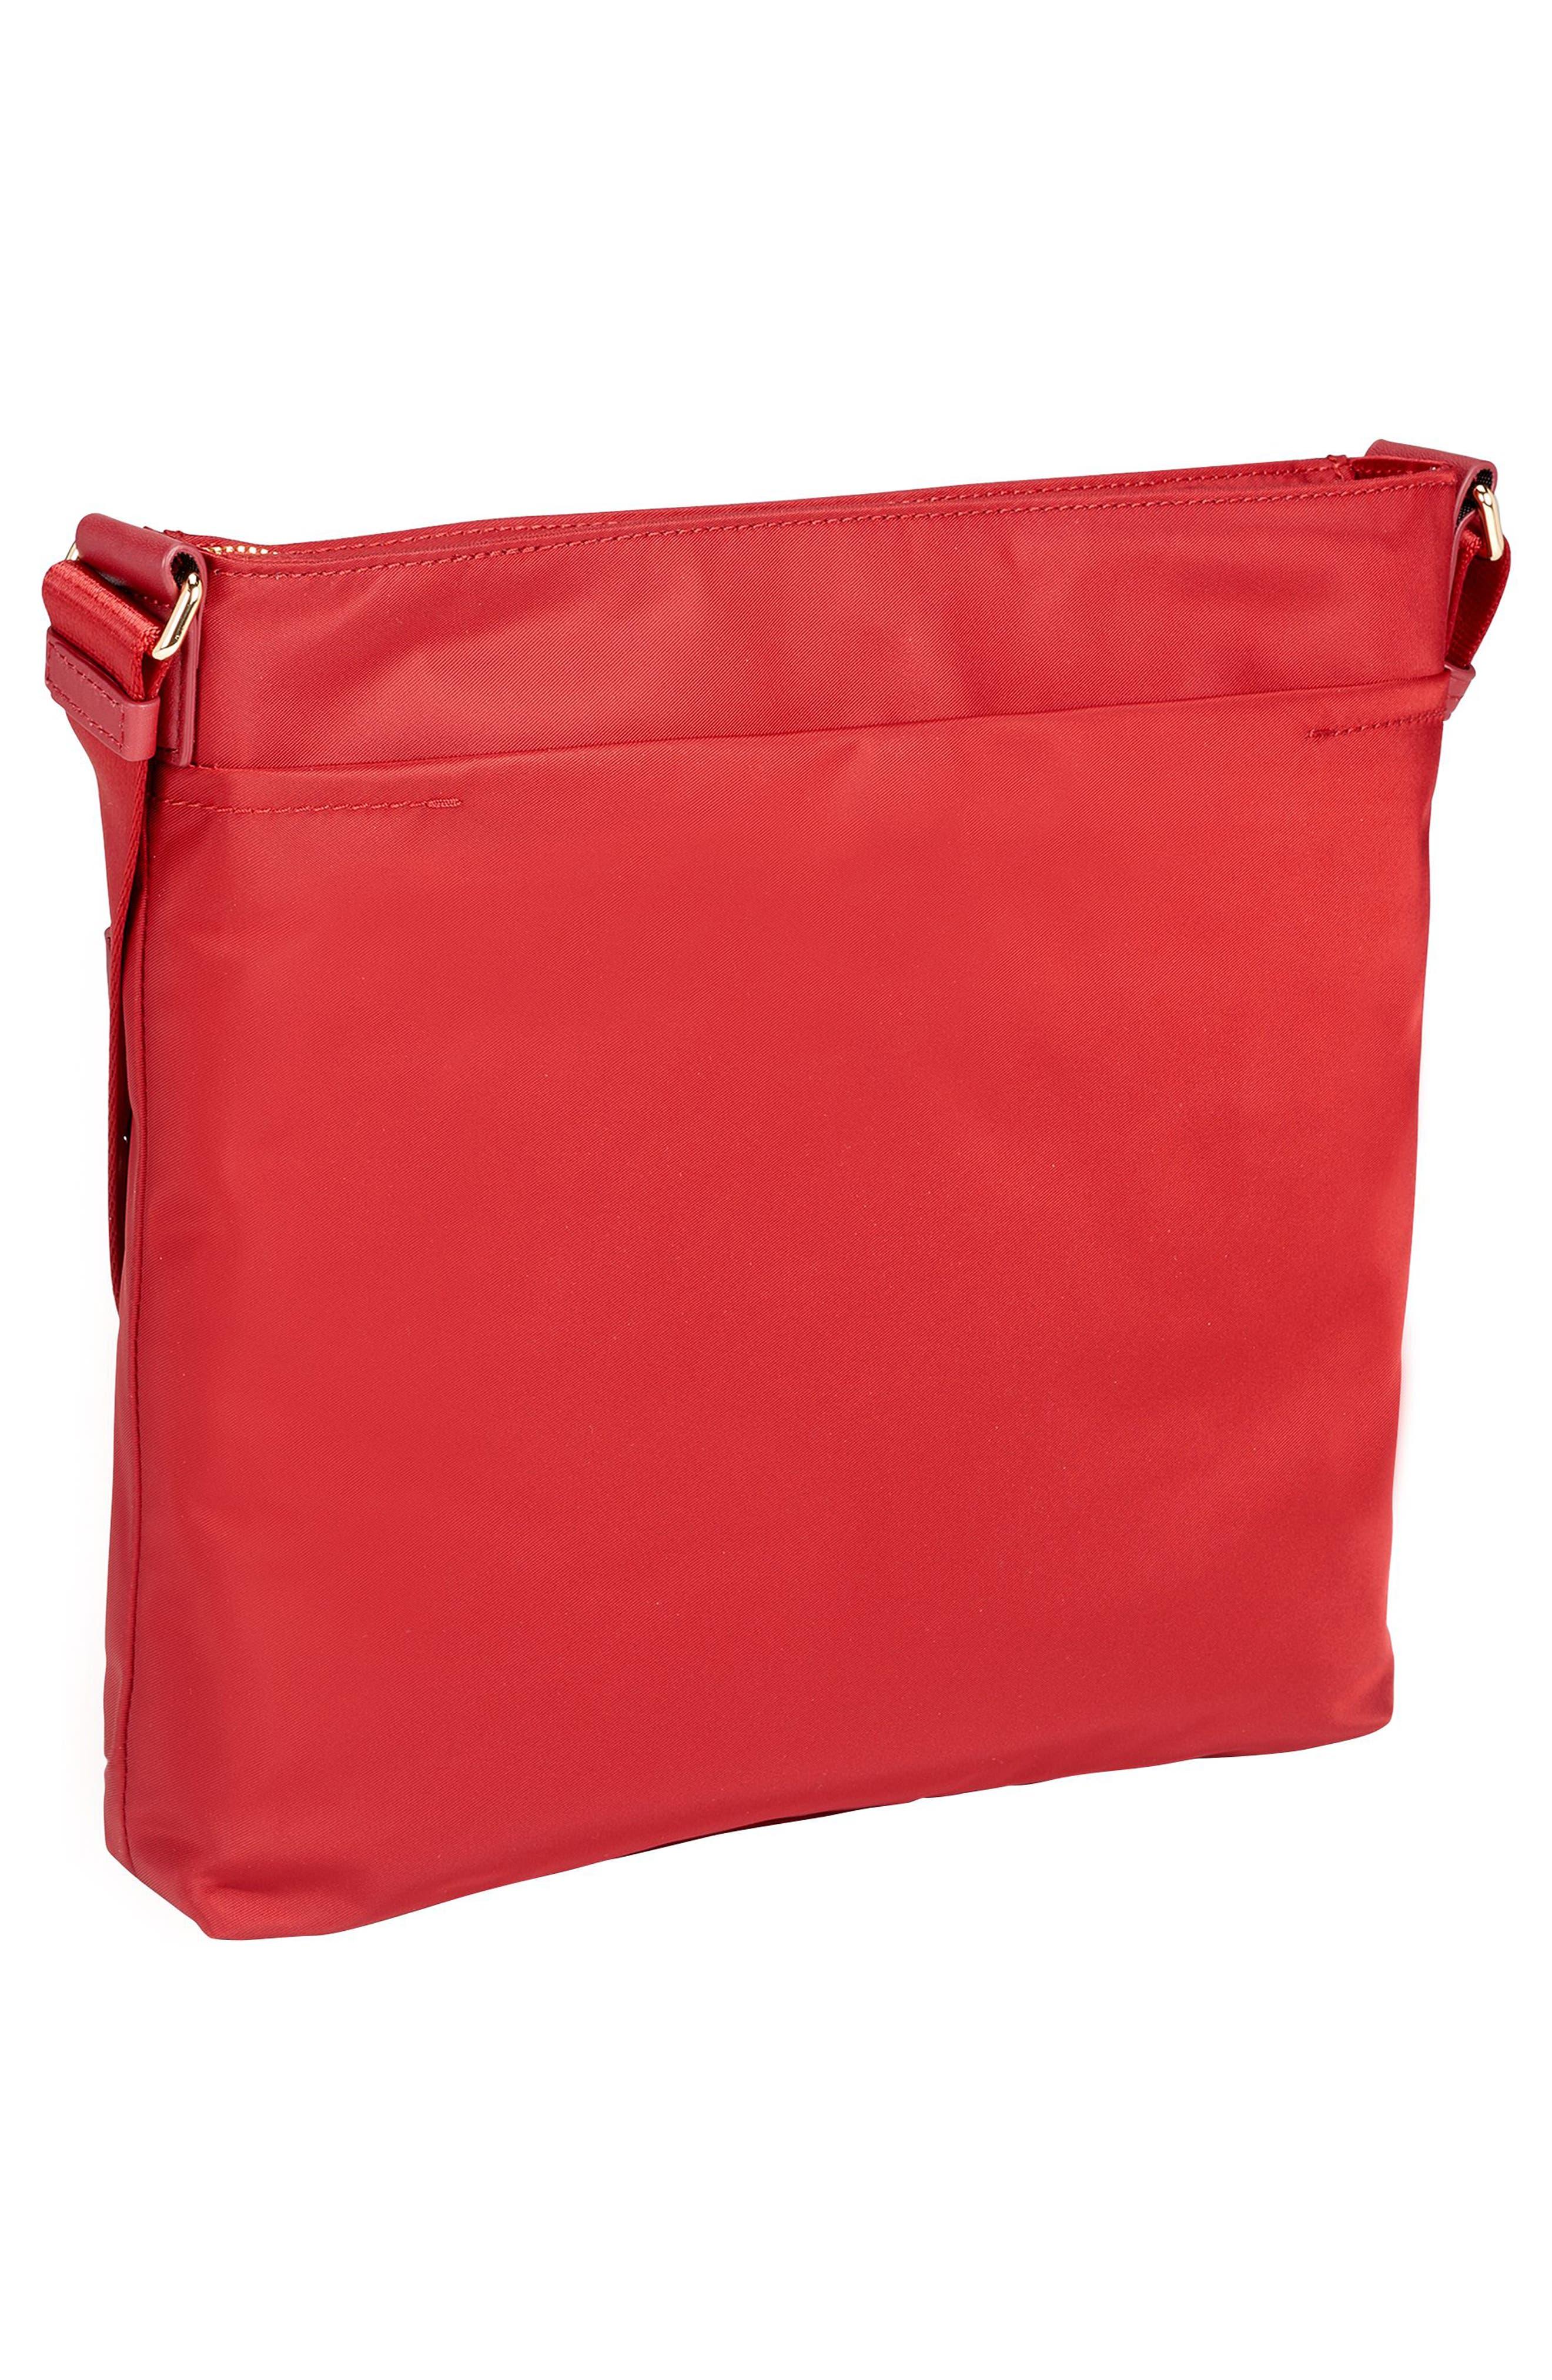 Alternate Image 3  - Tumi Voyageur - Capri Nylon Crossbody Bag